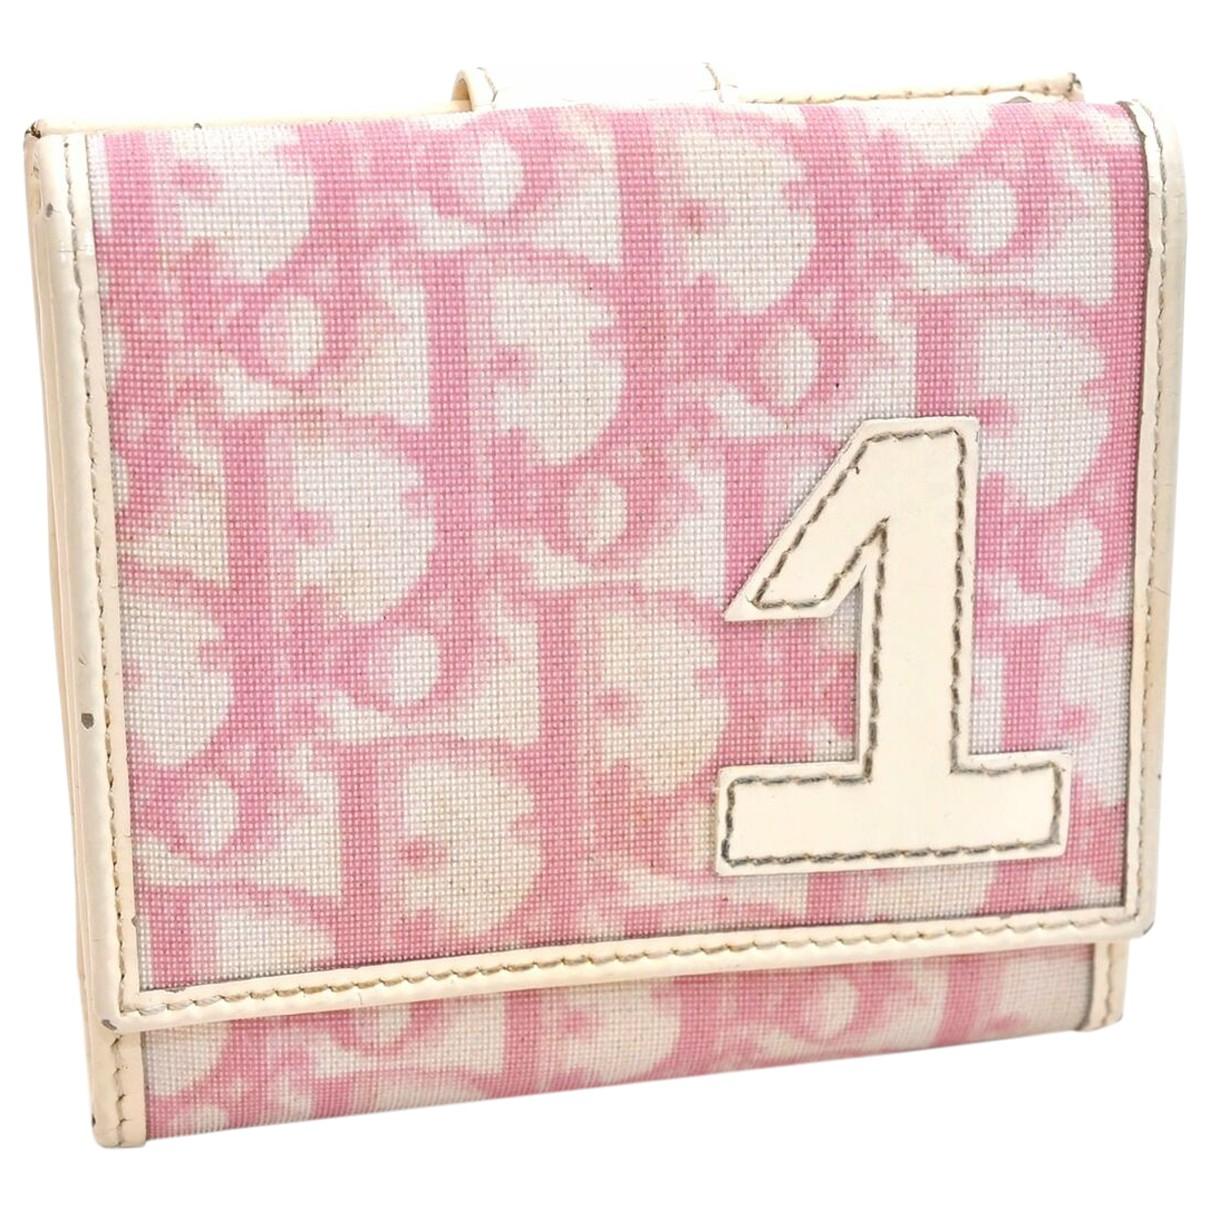 Dior - Portefeuille   pour femme - rose